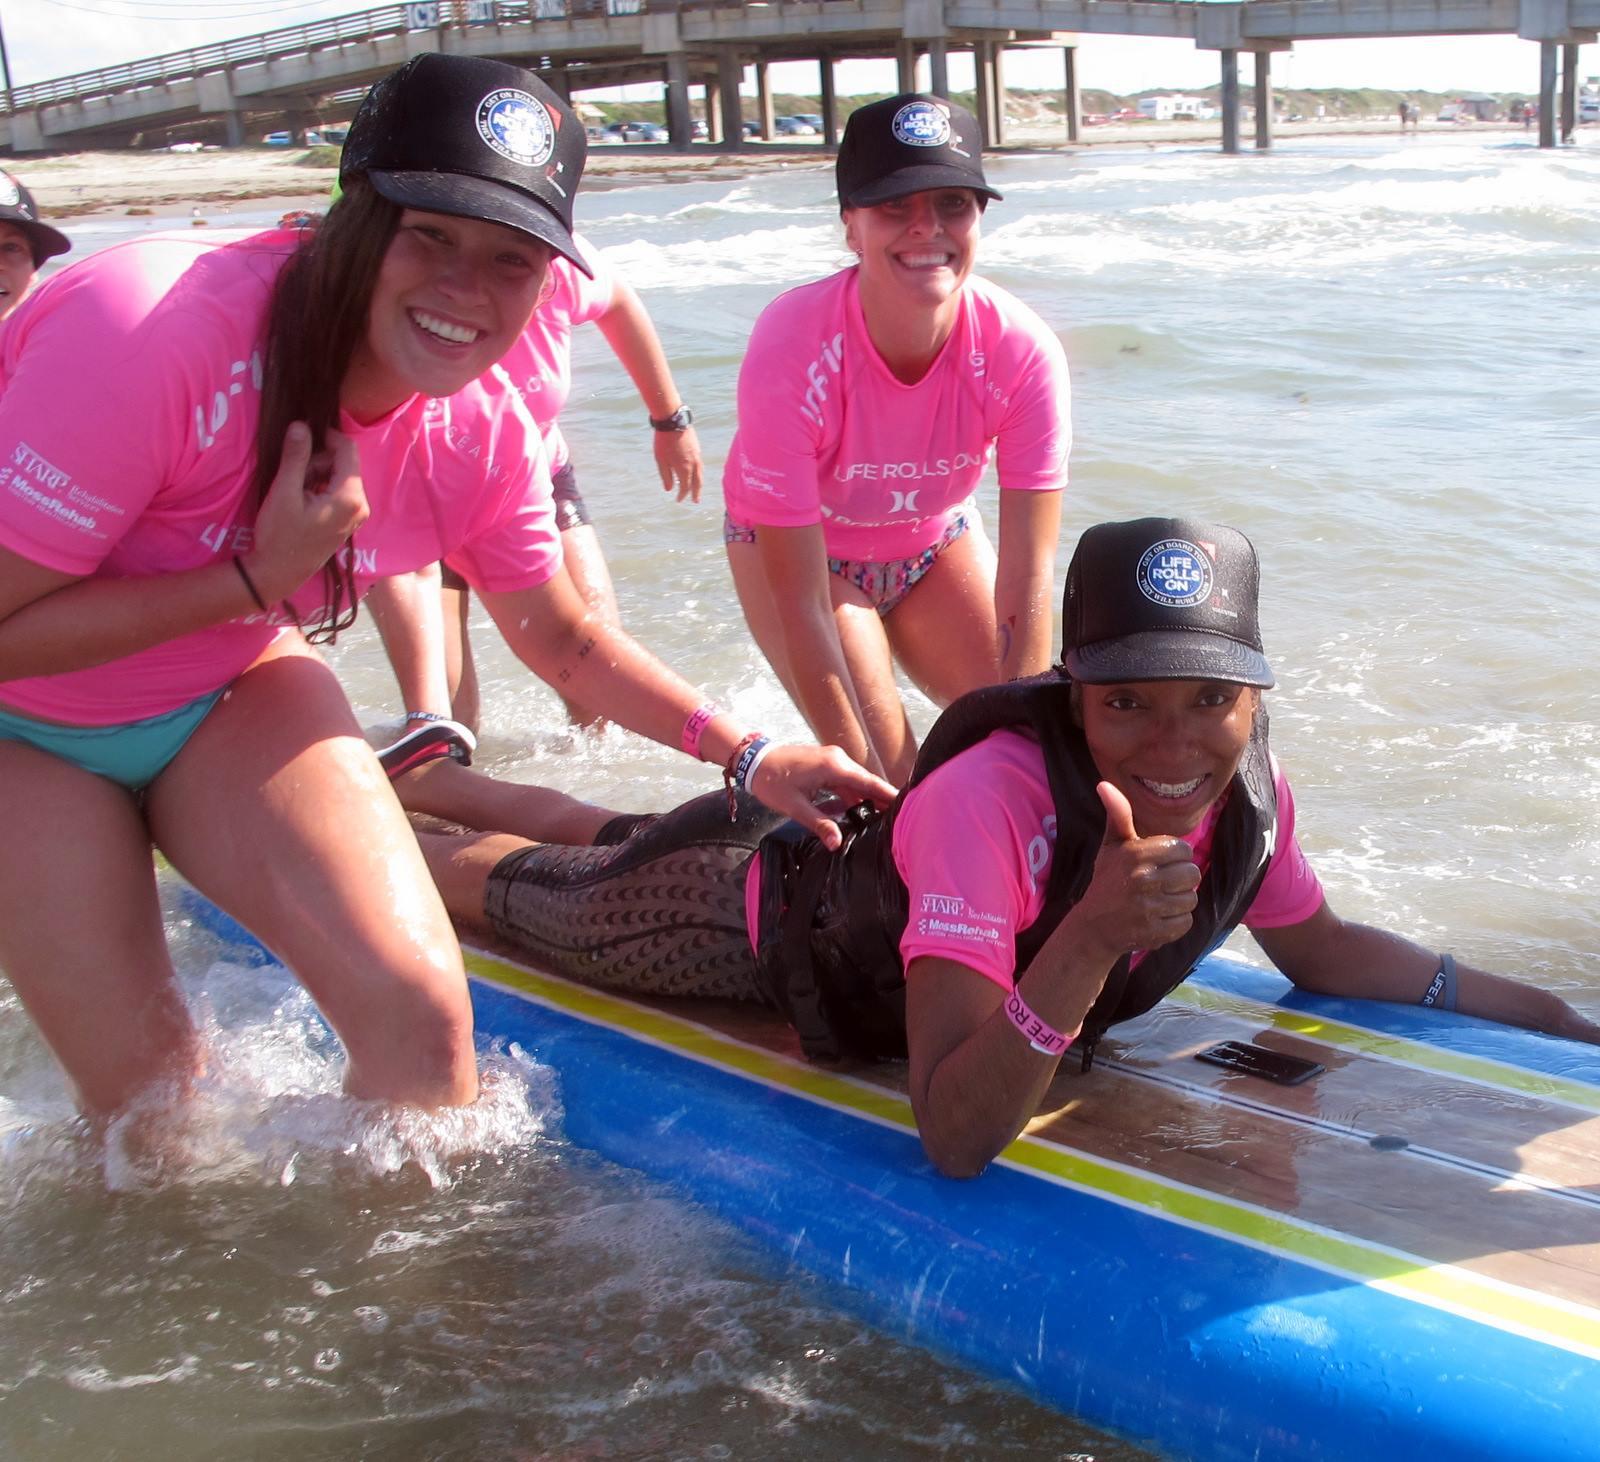 texas pink team closeup gayla kolle goff.jpg